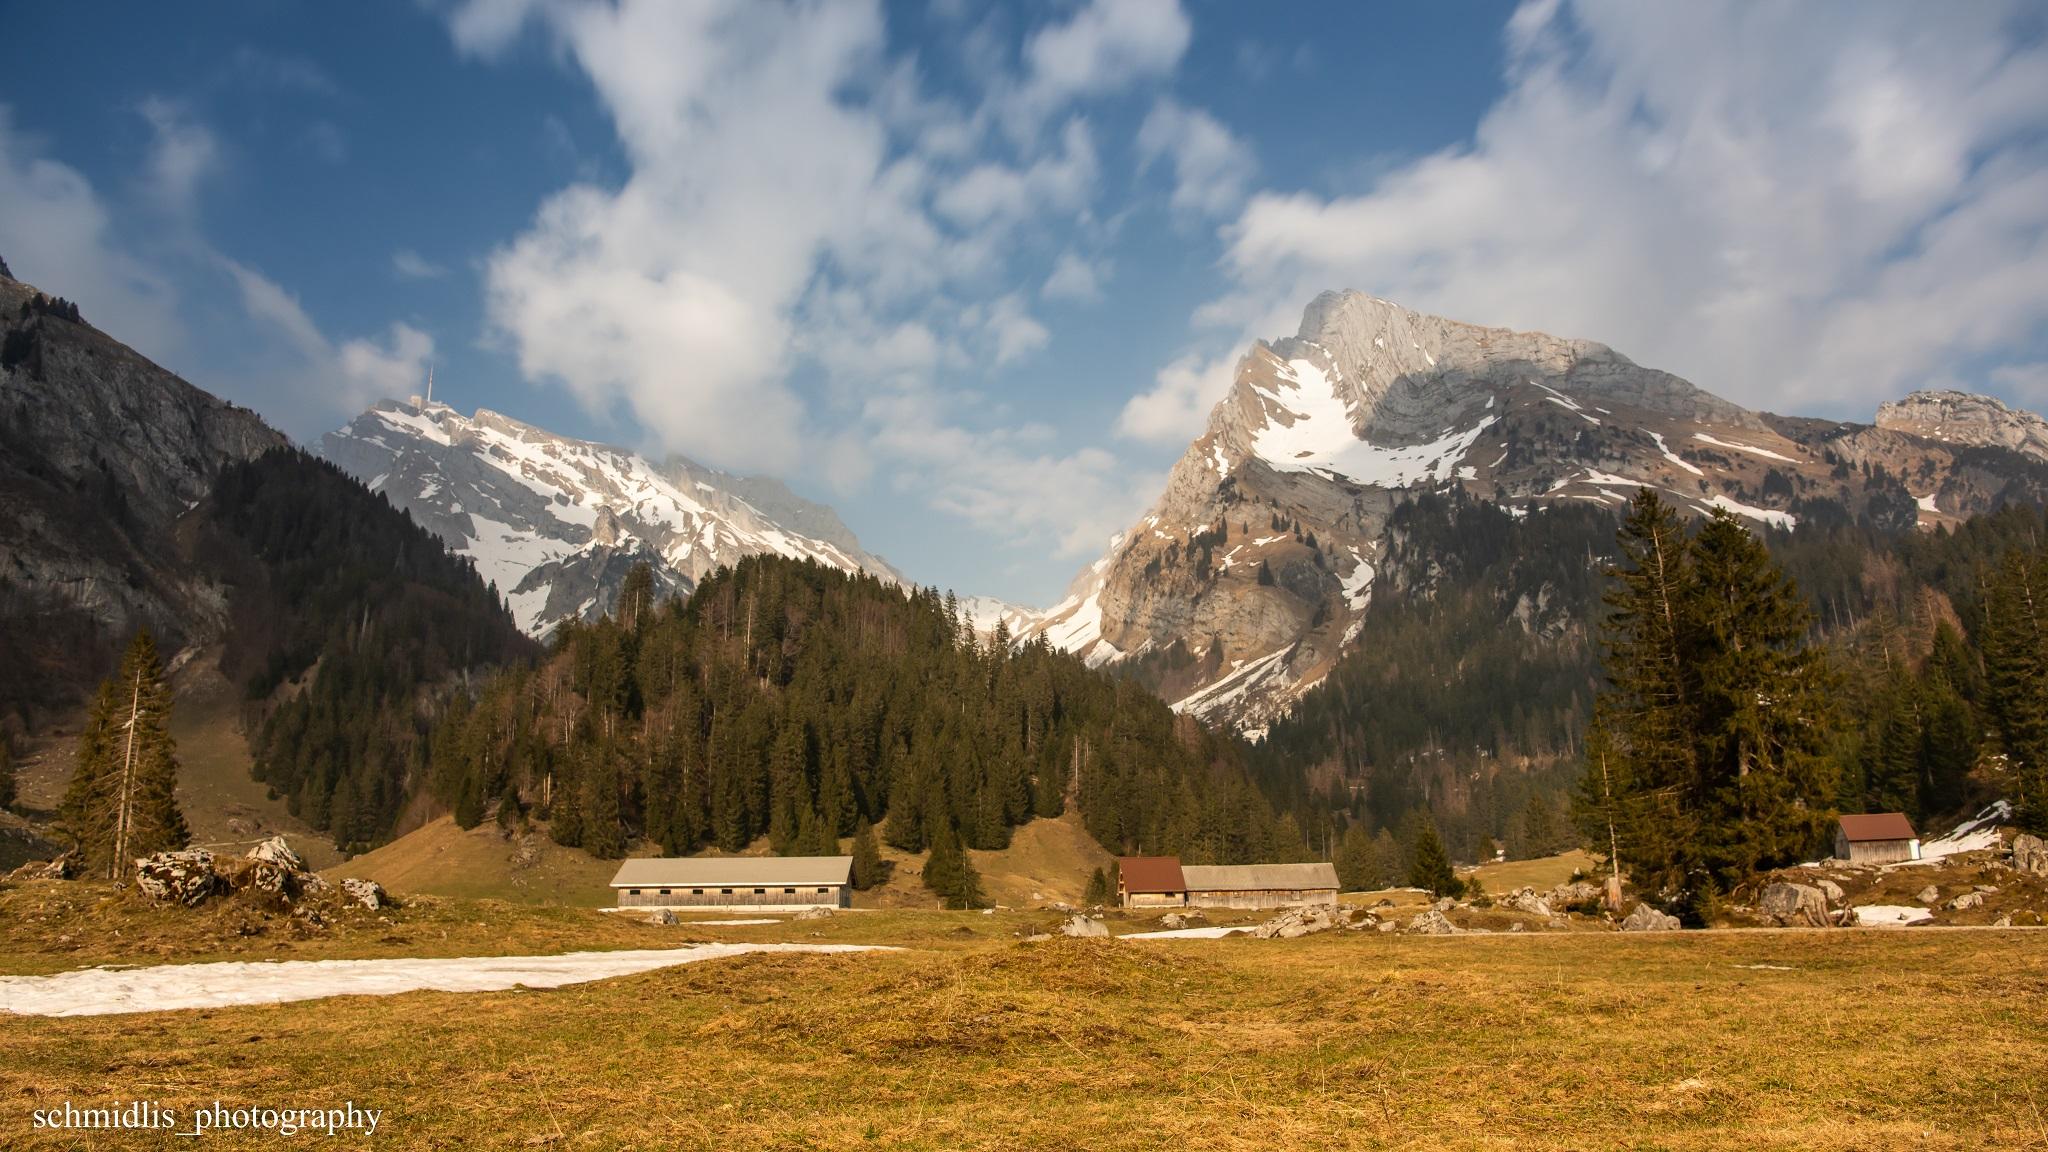 Laui, Switzerland